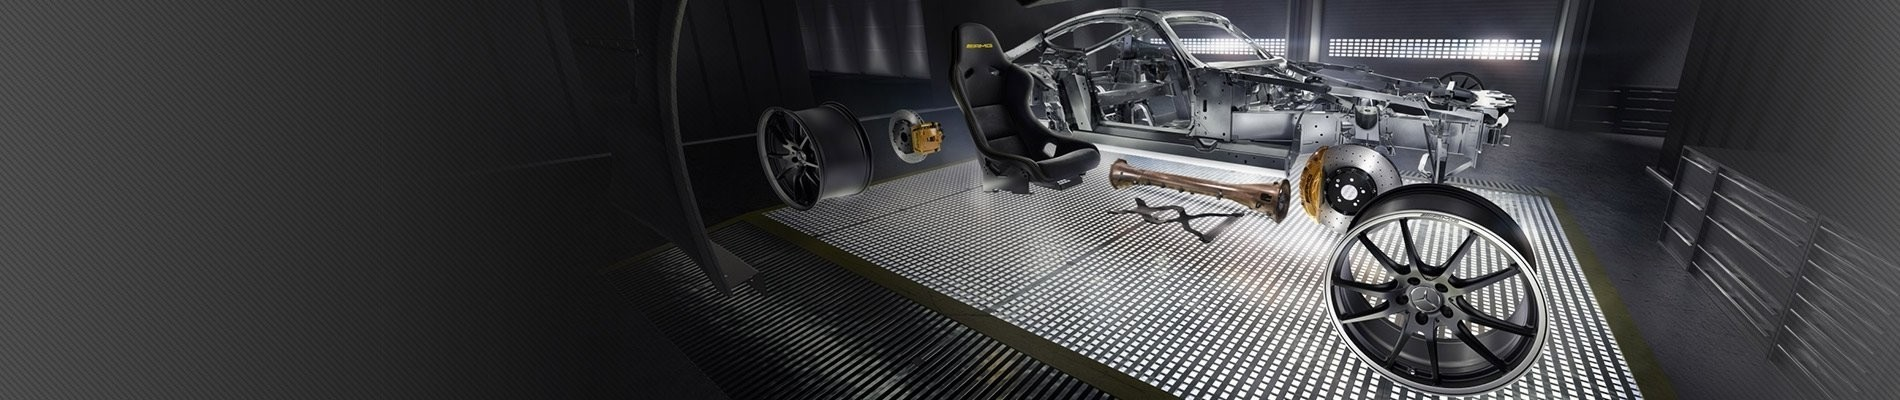 genuine m benz service parts mercedes and performance genuineparts